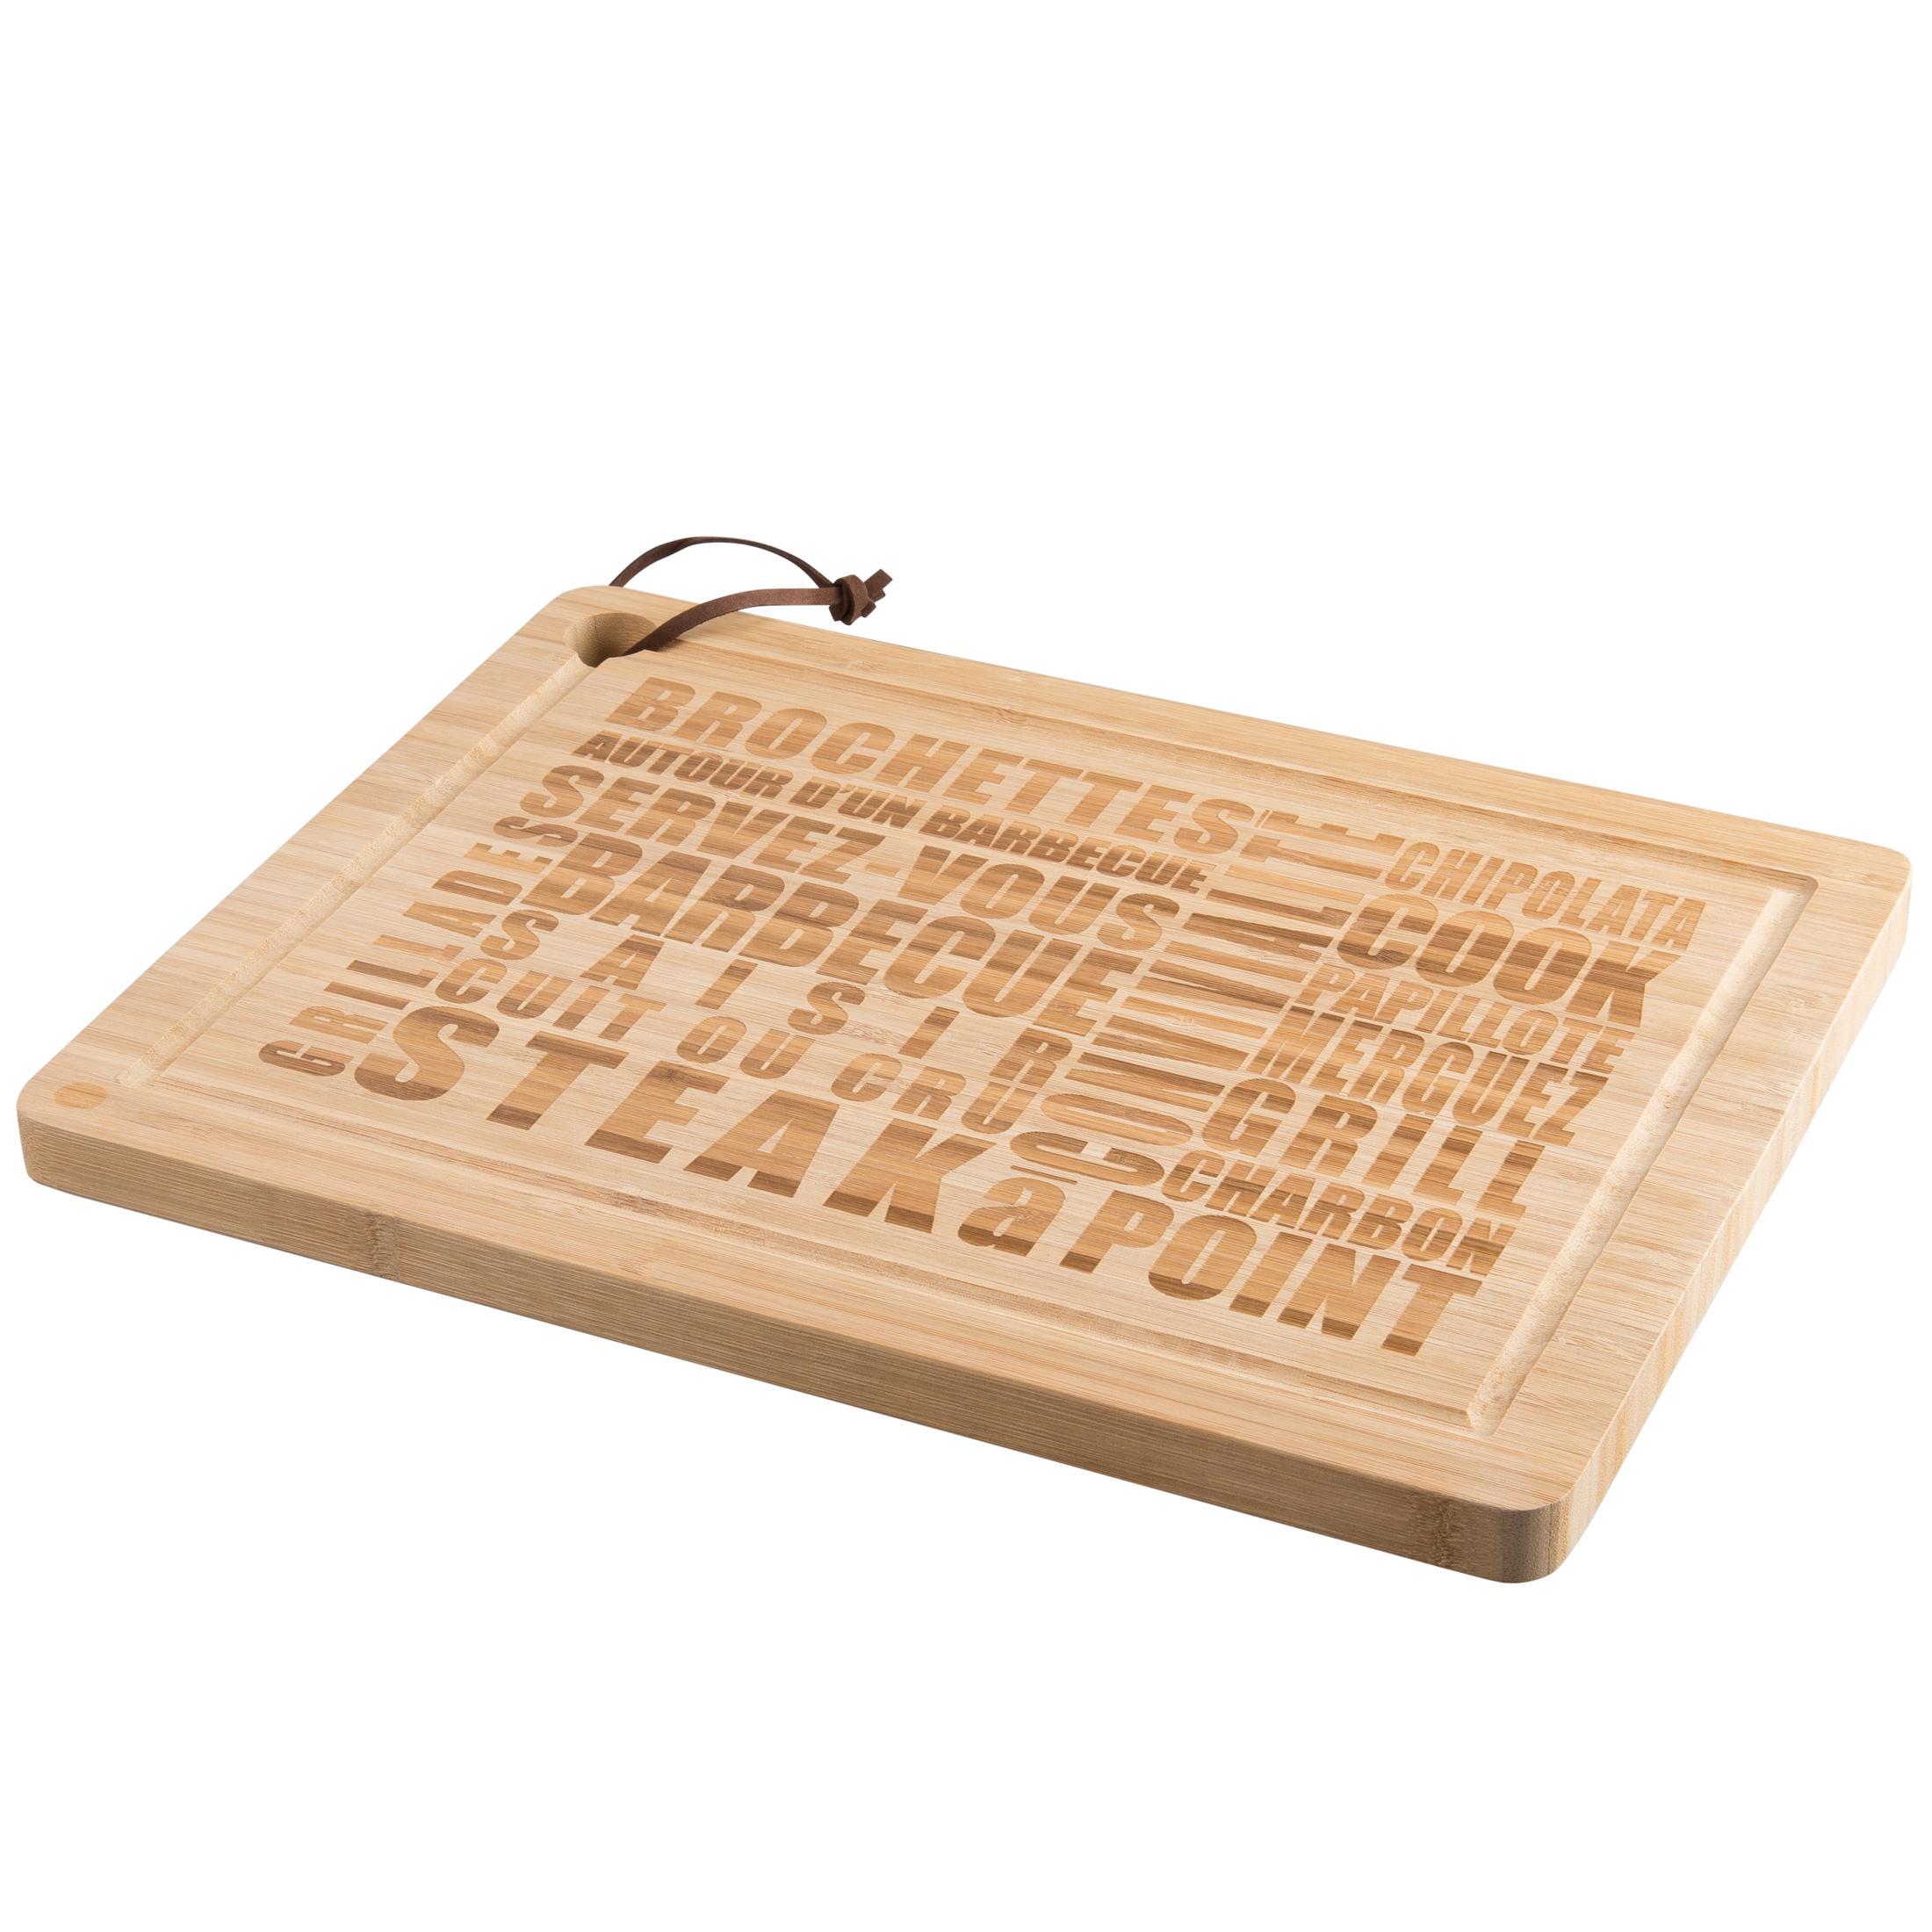 levivo schneidebrett gro aus bambus holz schneidbrett mit saftrille servierbrett bambusholz. Black Bedroom Furniture Sets. Home Design Ideas